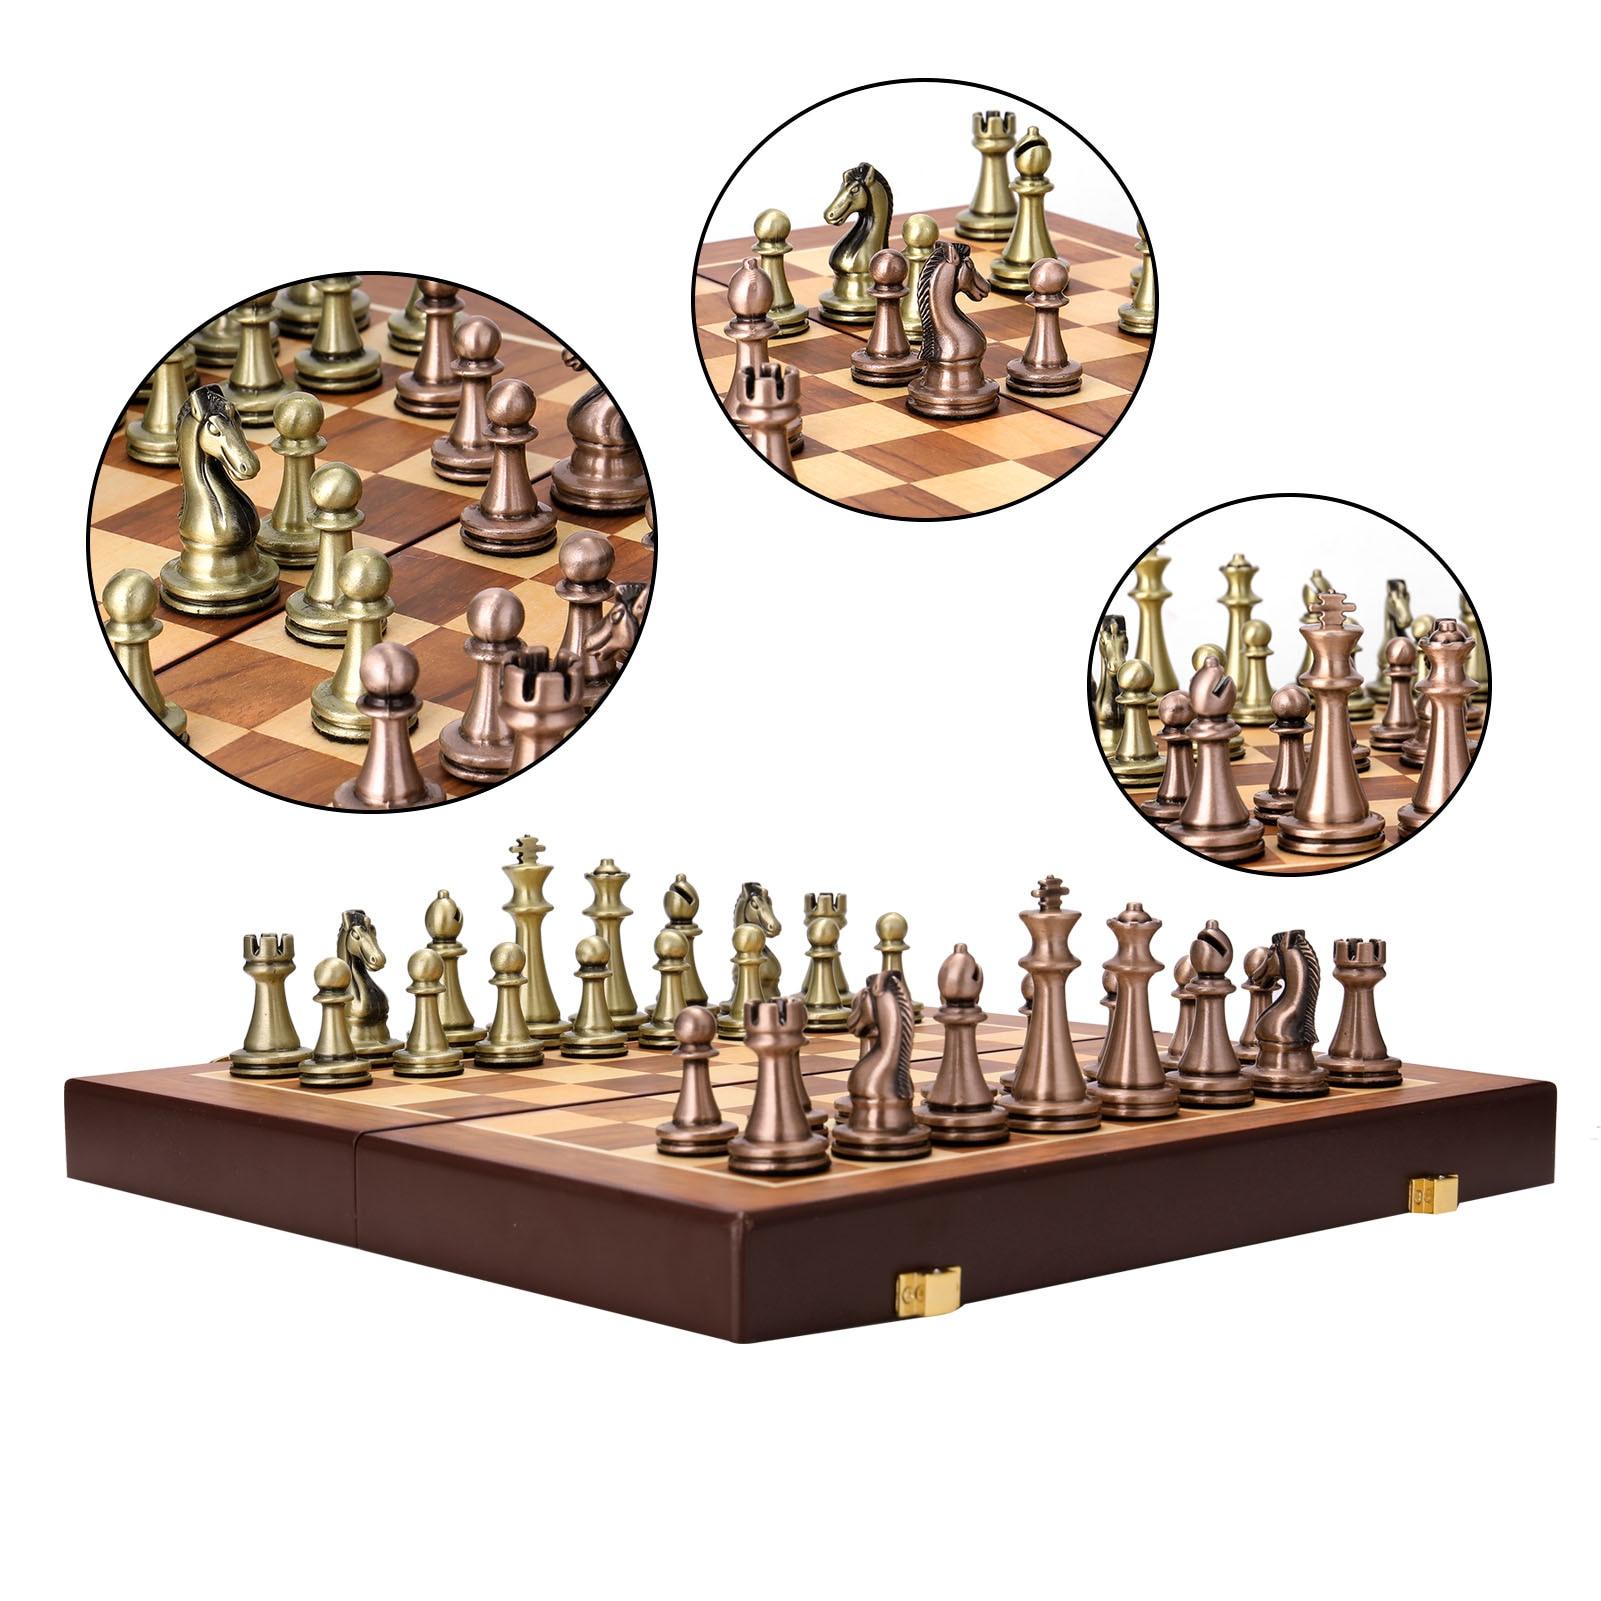 Металлические шахматы, металлические шахматы, деревянная складная шахматная доска из сплава, настольная игра, шахматная доска, подарок